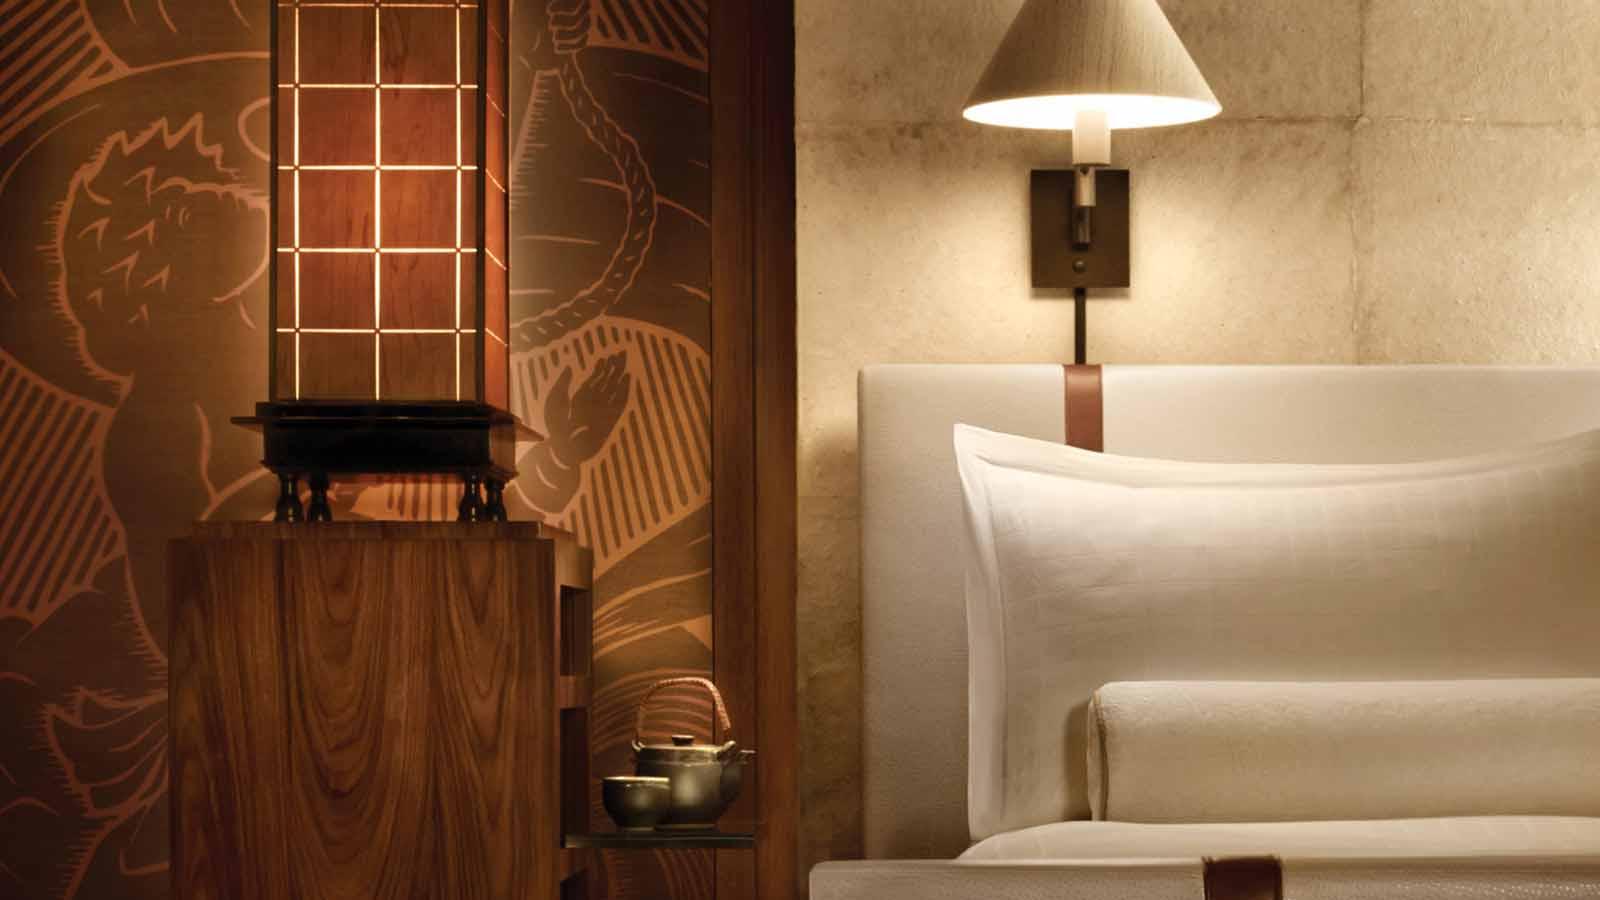 33674468_fs_manele_bay_guestrooms_7.jpg